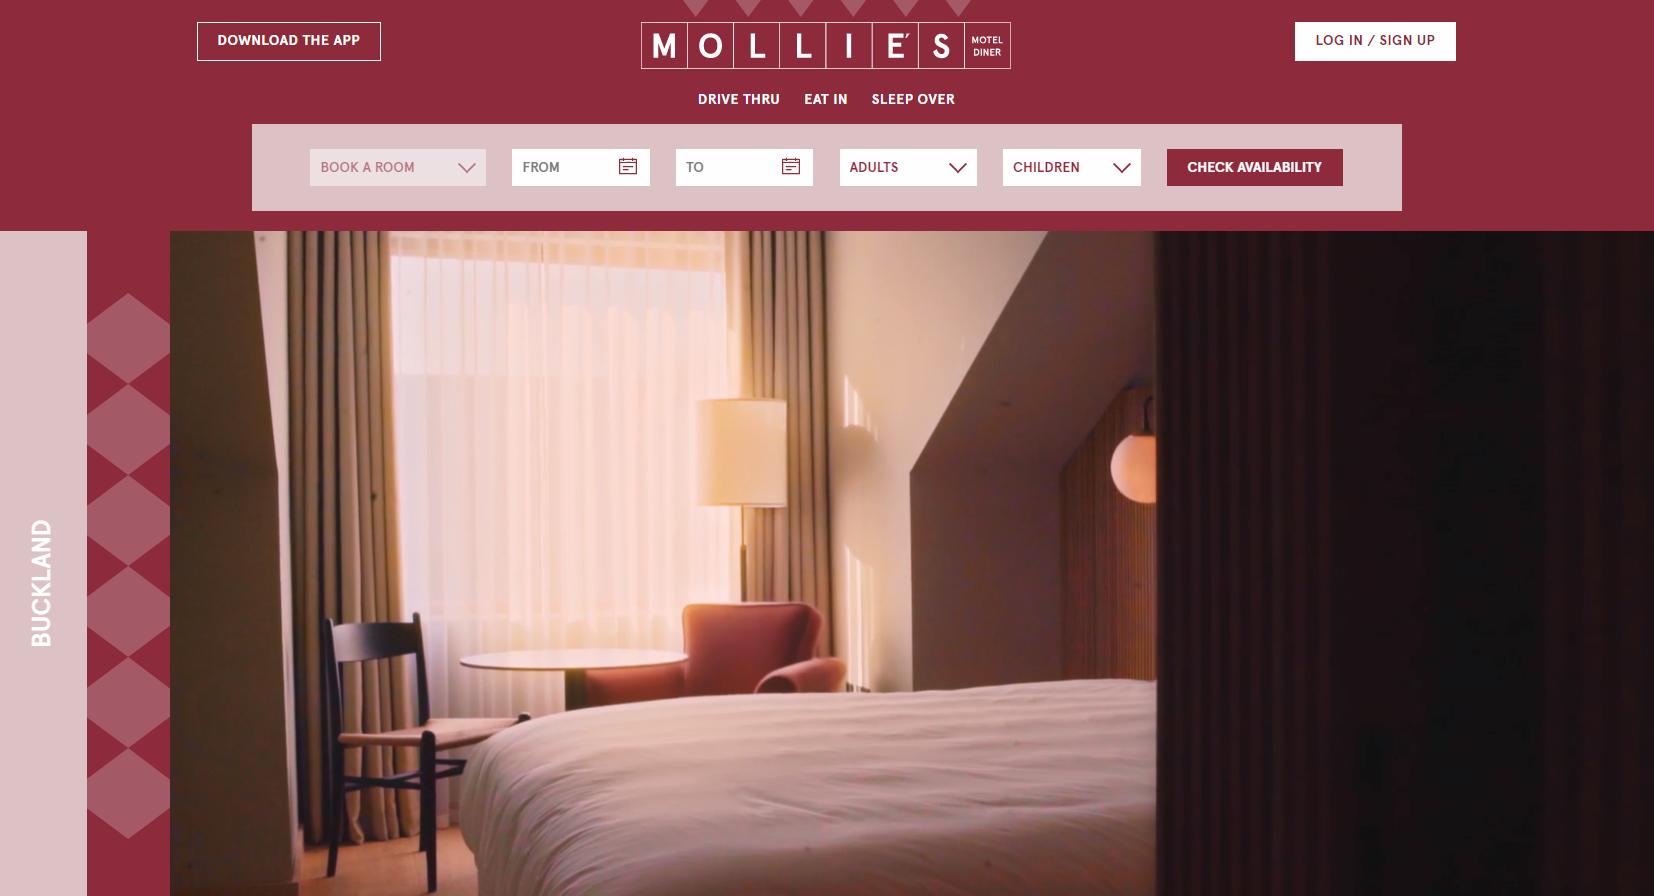 Mollie's Motel